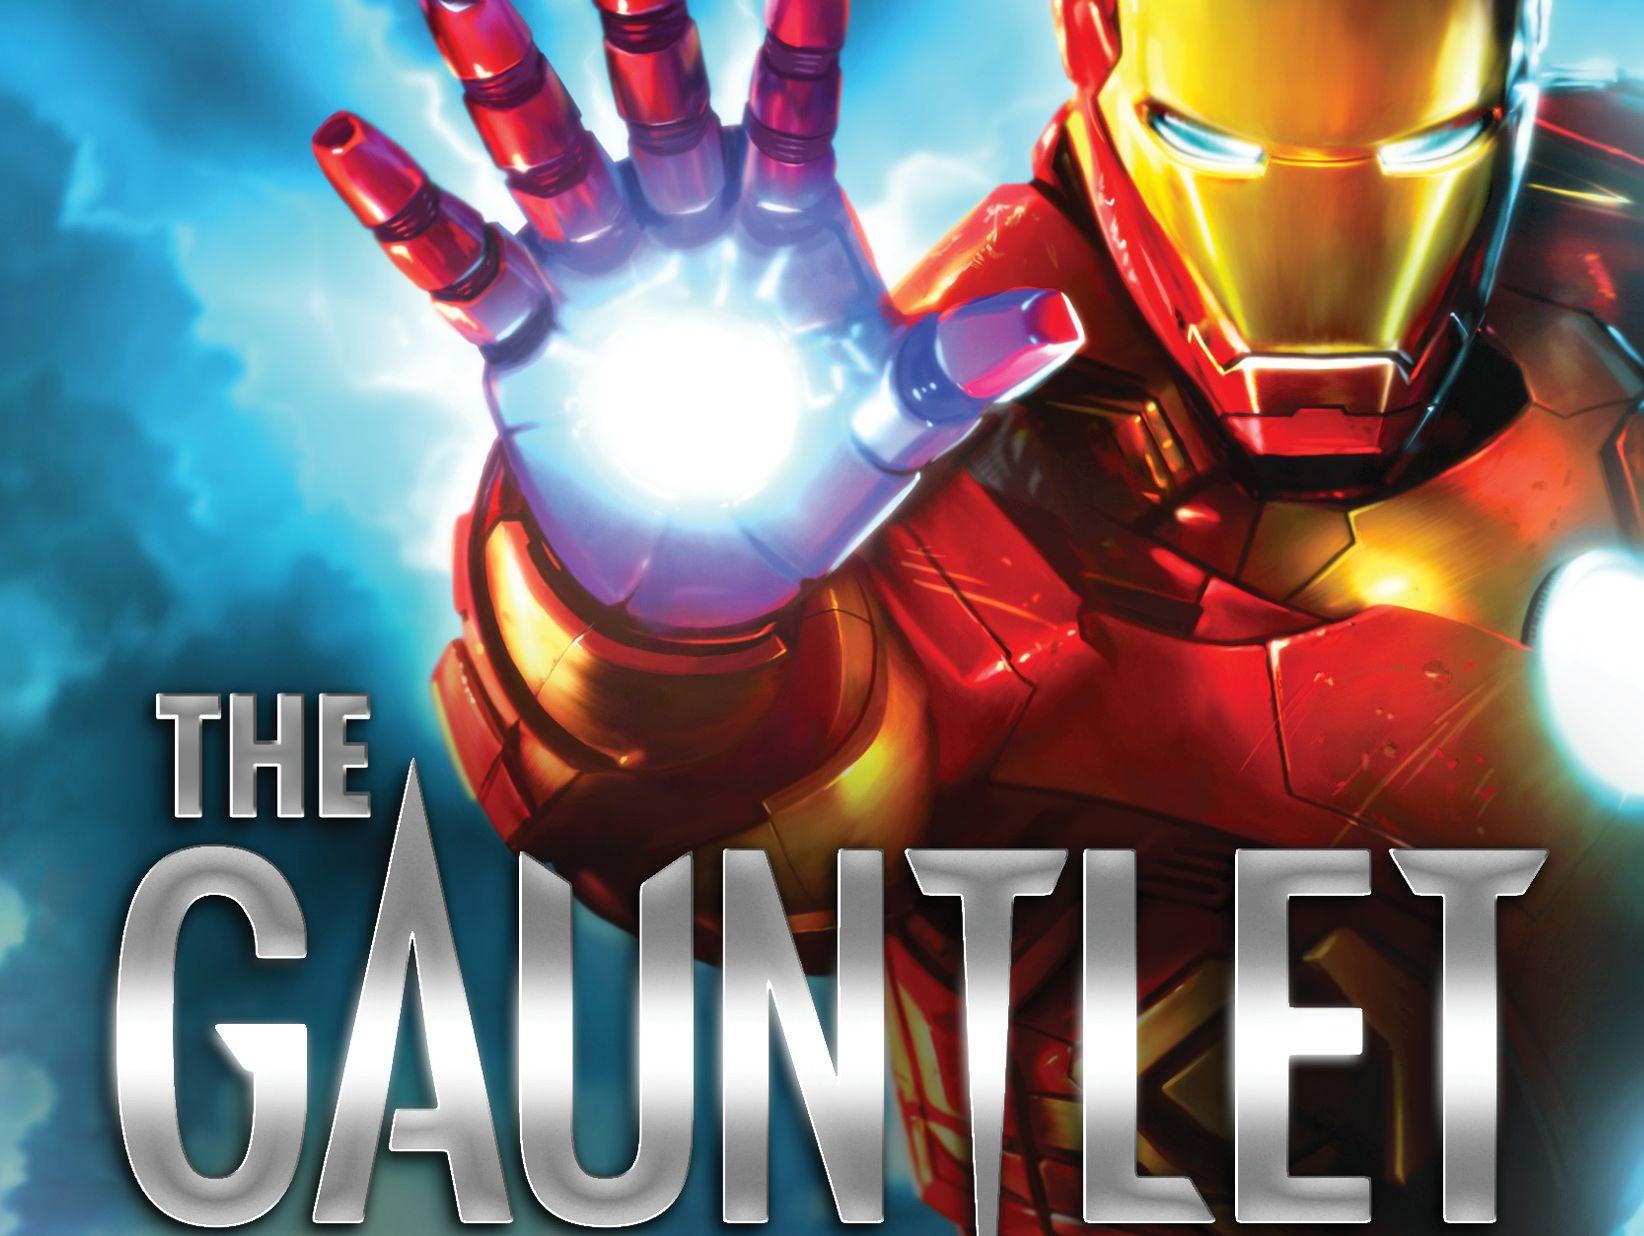 Eoin Colfer habla sobre The Gauntlet, su novela de Iron Man